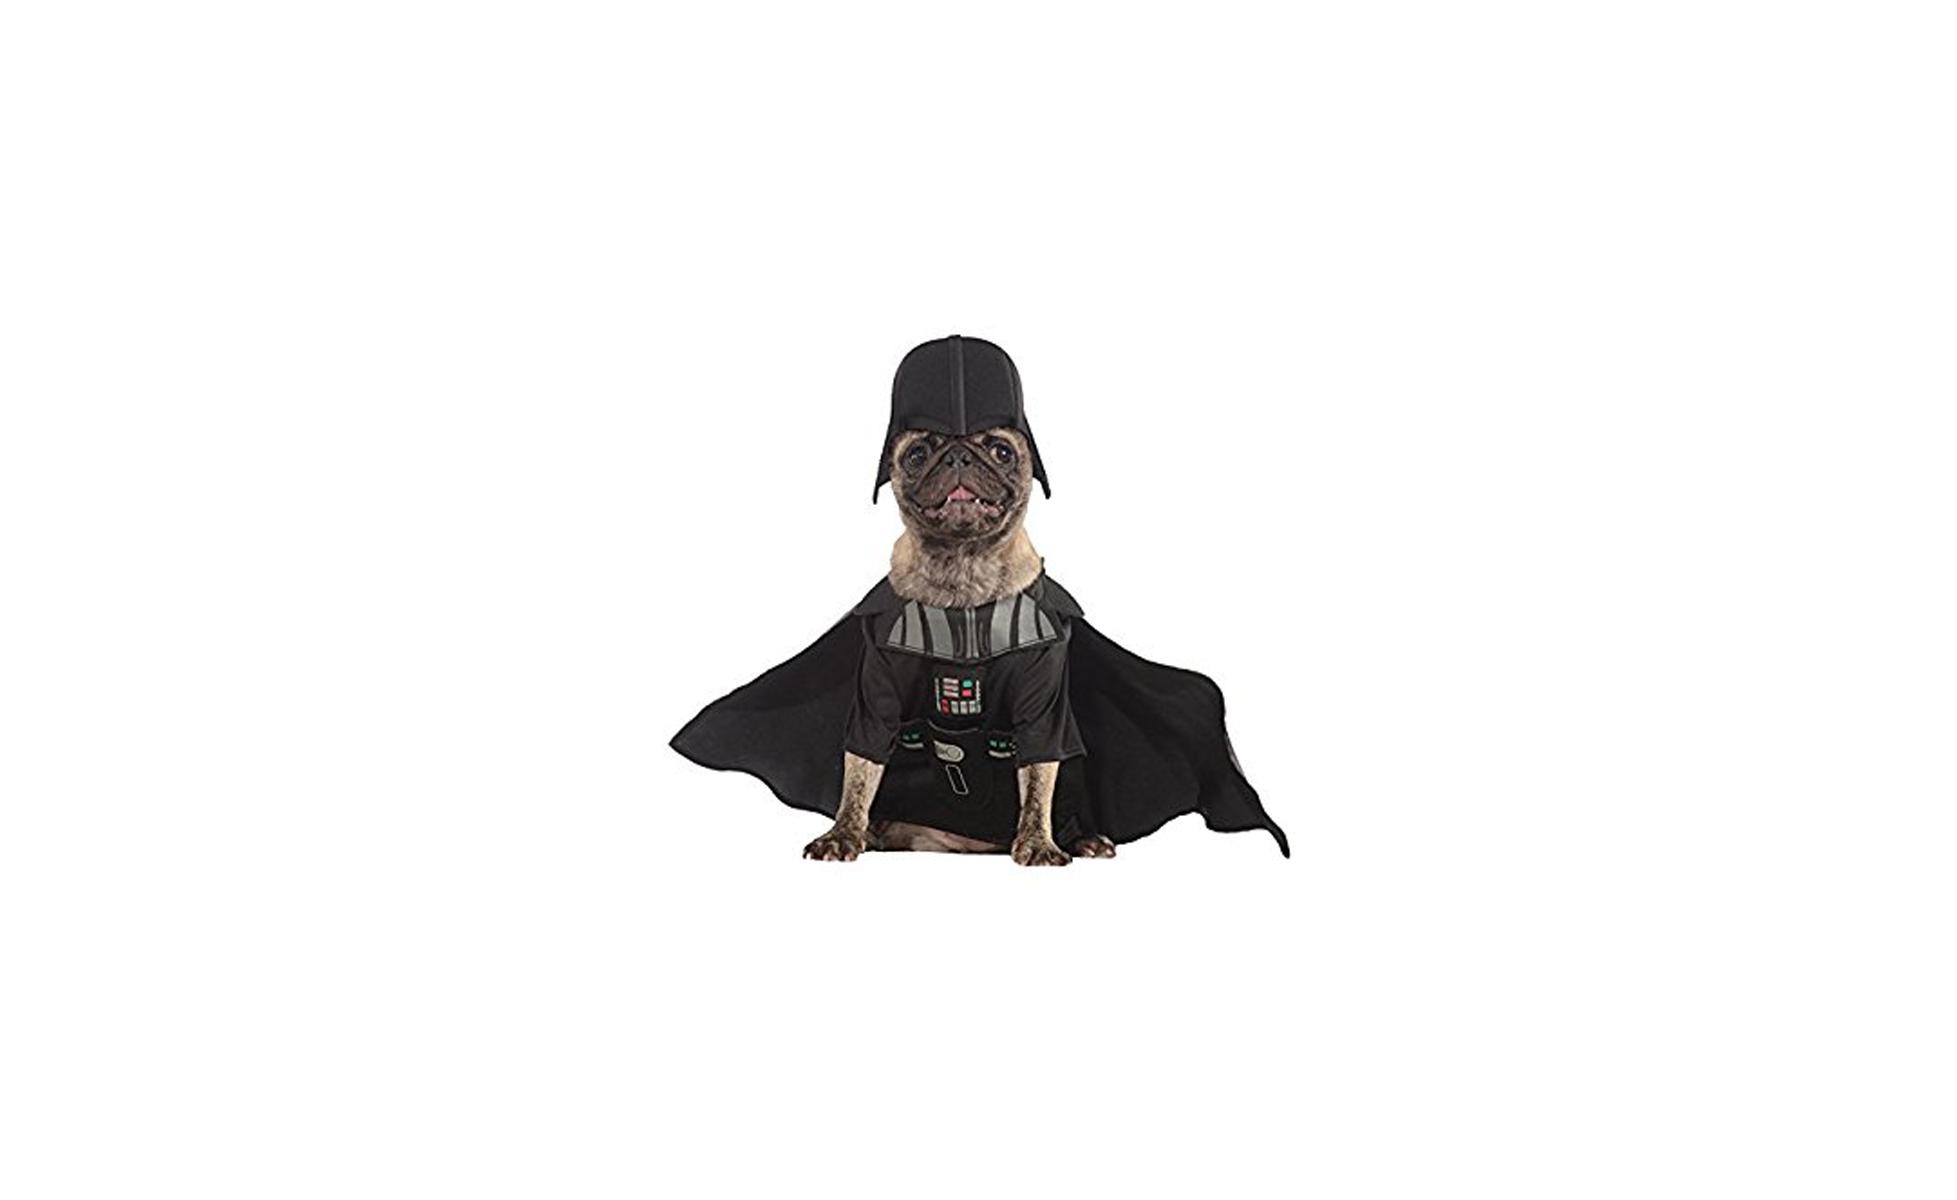 Darth Vader Dog Costume at Wayfair